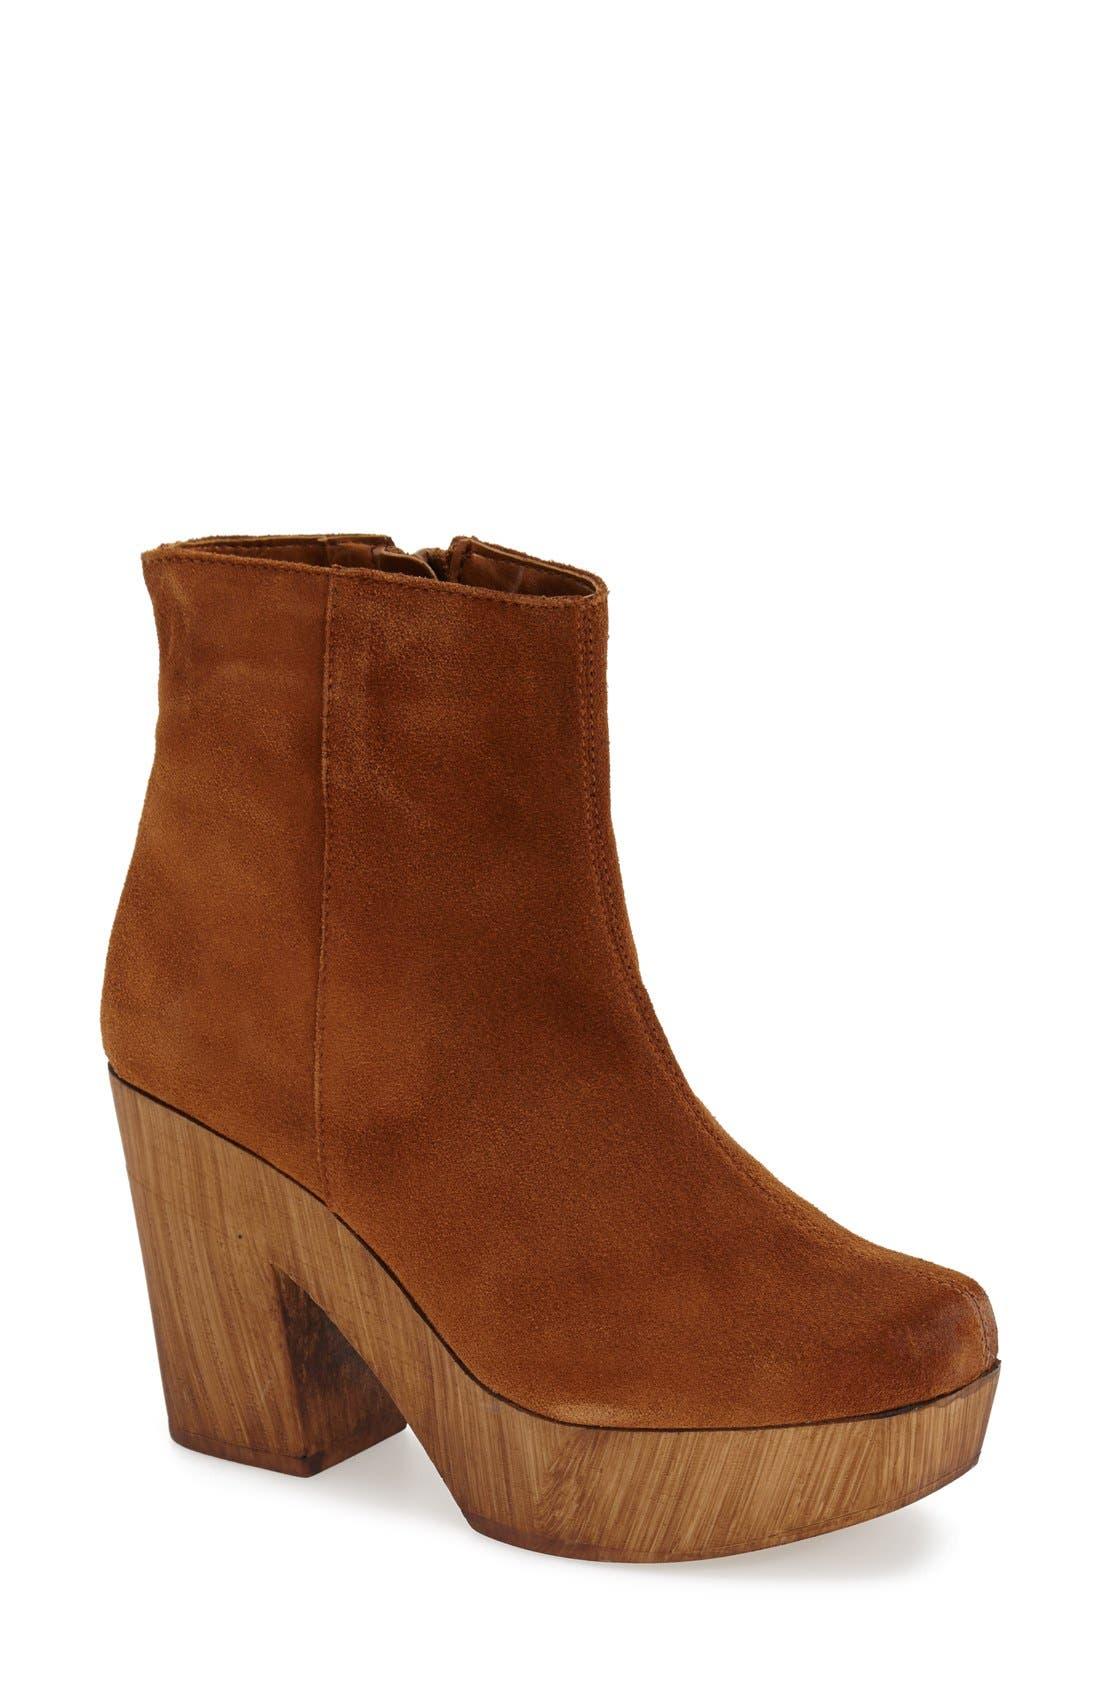 Alternate Image 1 Selected - Topshop 'Hitch' Platform Chelsea Boot (Women)